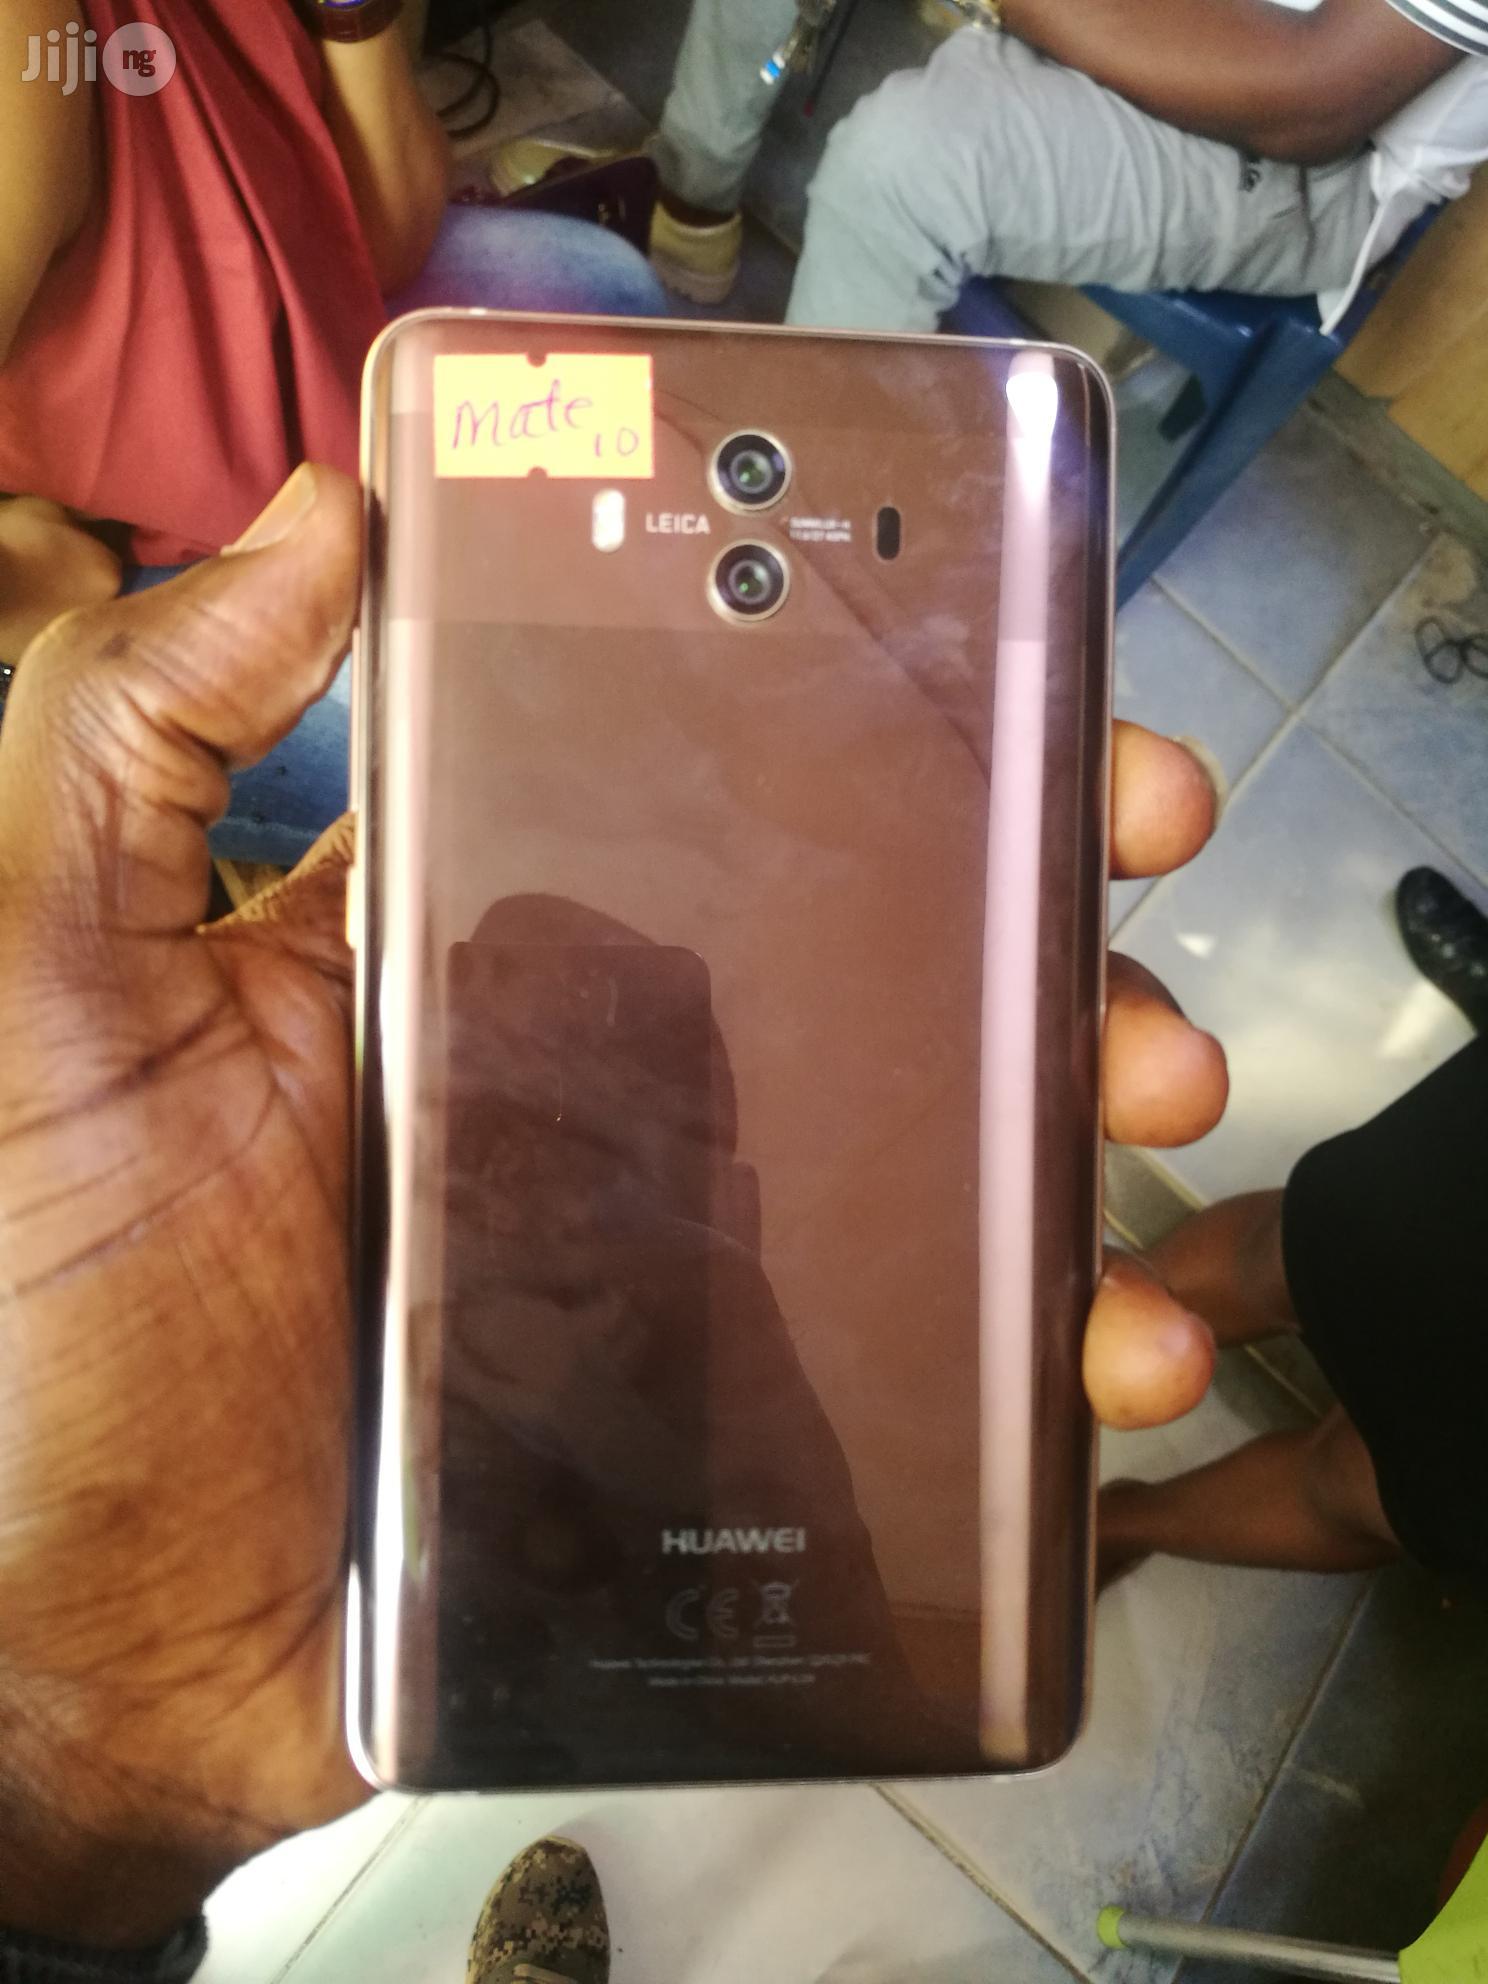 Huawei Mate 10 64 GB | Mobile Phones for sale in Ikeja, Lagos State, Nigeria